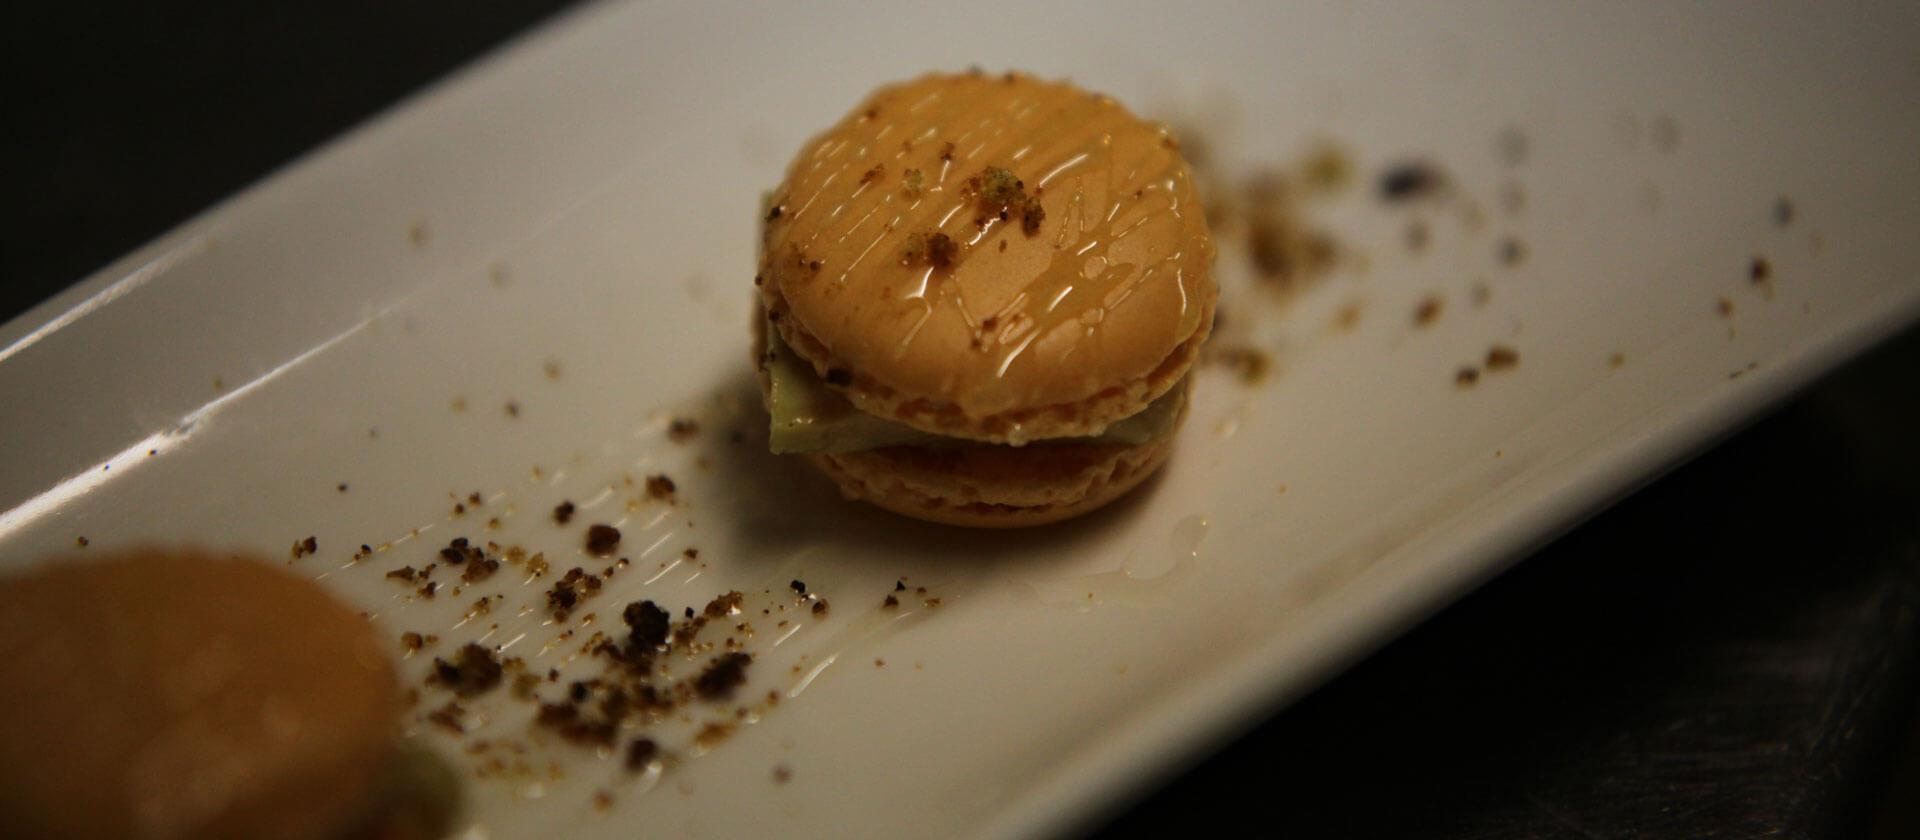 Macaron Foie